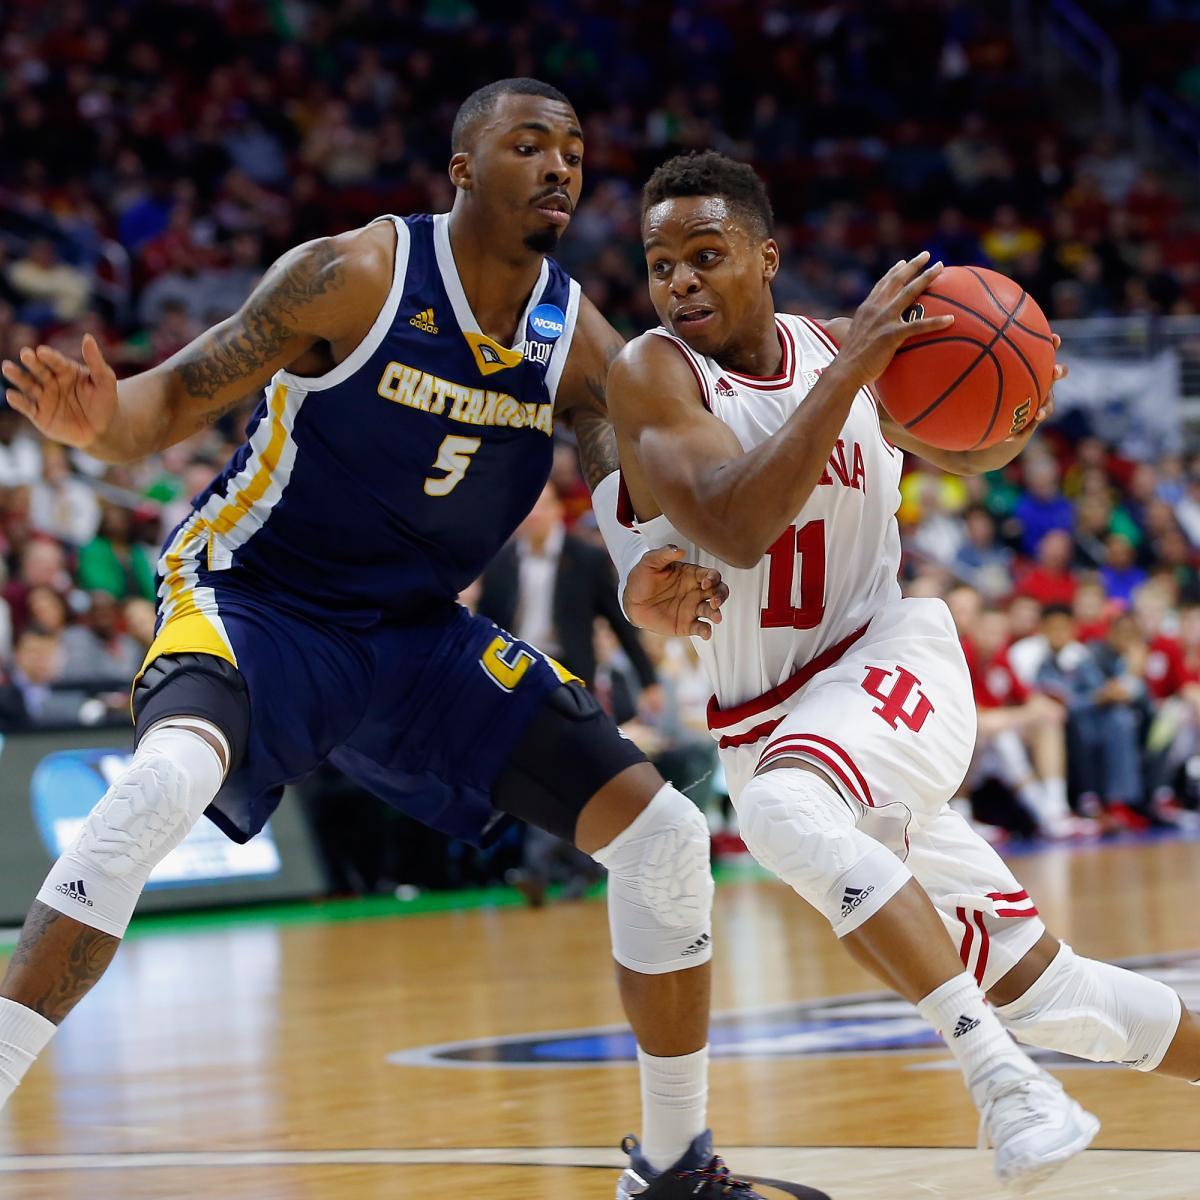 2016 NBA Draft Prospects: Breaking Down Pro Future of